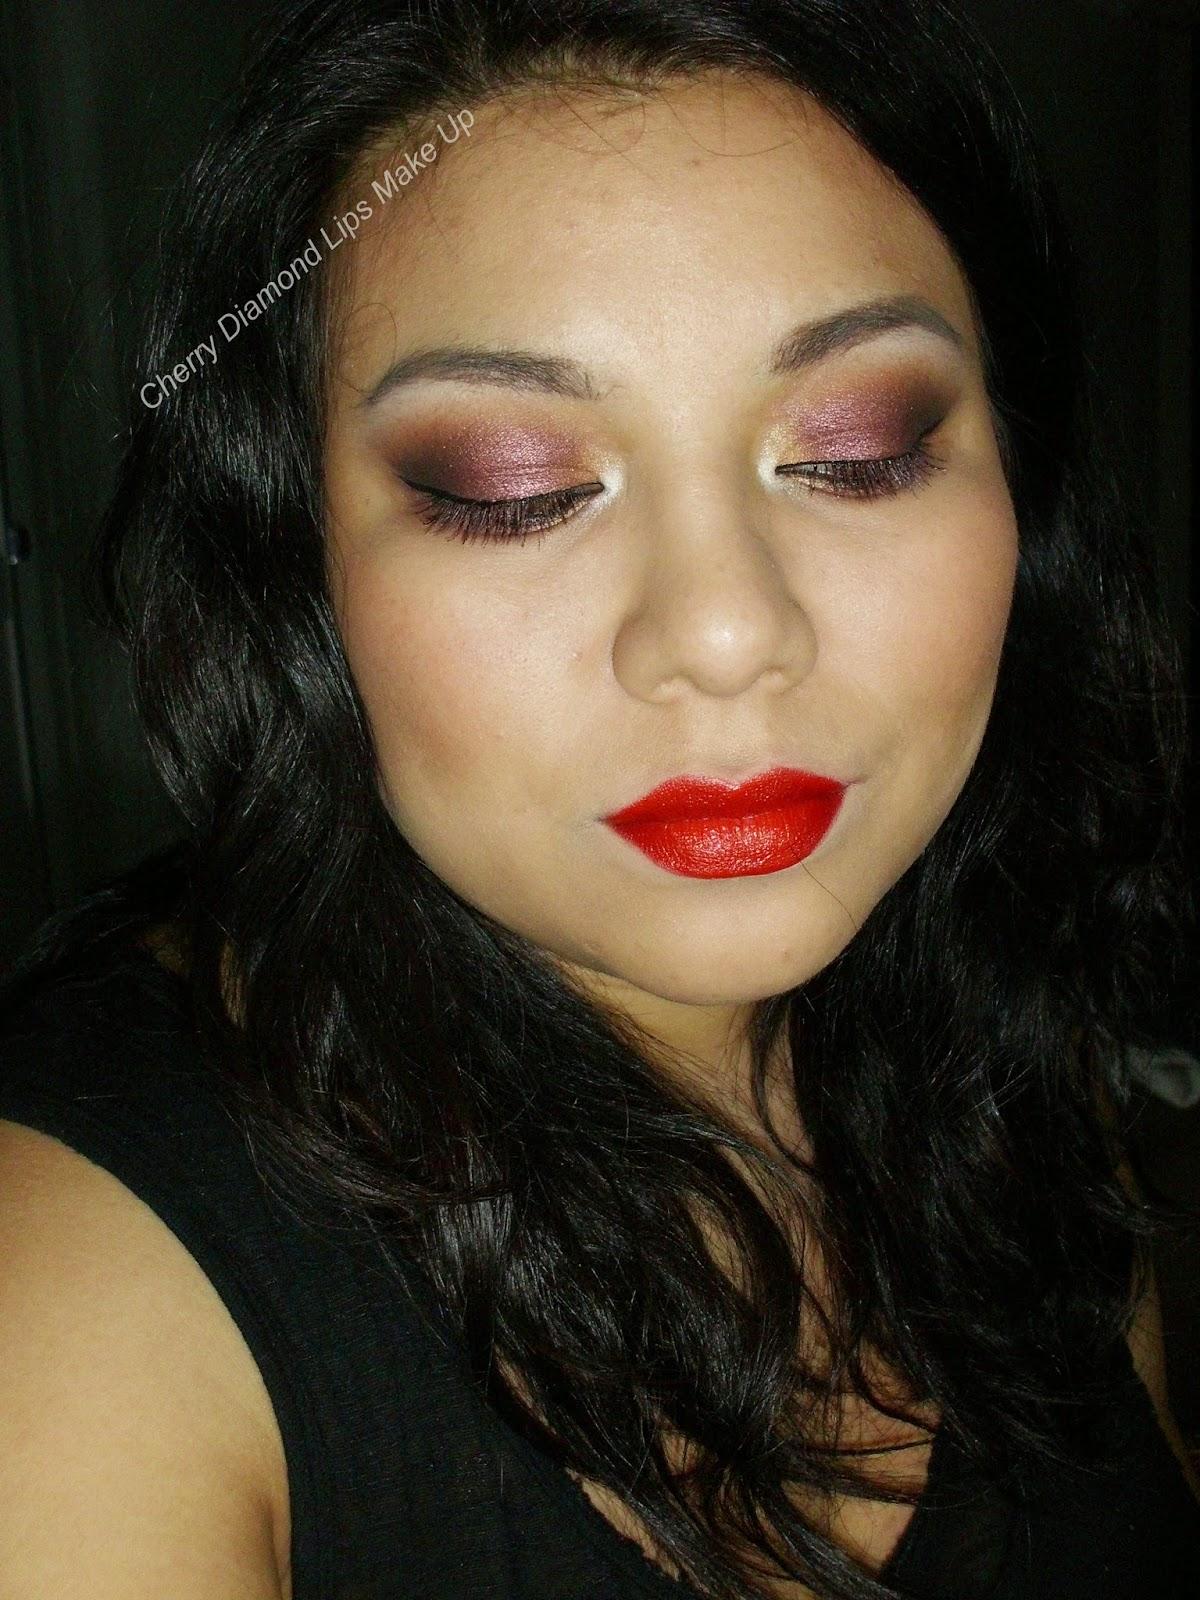 Paciugopedia, Ely marino, Cherry Diamond Lips, Shimmering Sienna, Revlon, Dusk TIl Dawn, Mua Cosmetics, Im Pupa 307, Nabla Cosmetics, Makeup Revolution